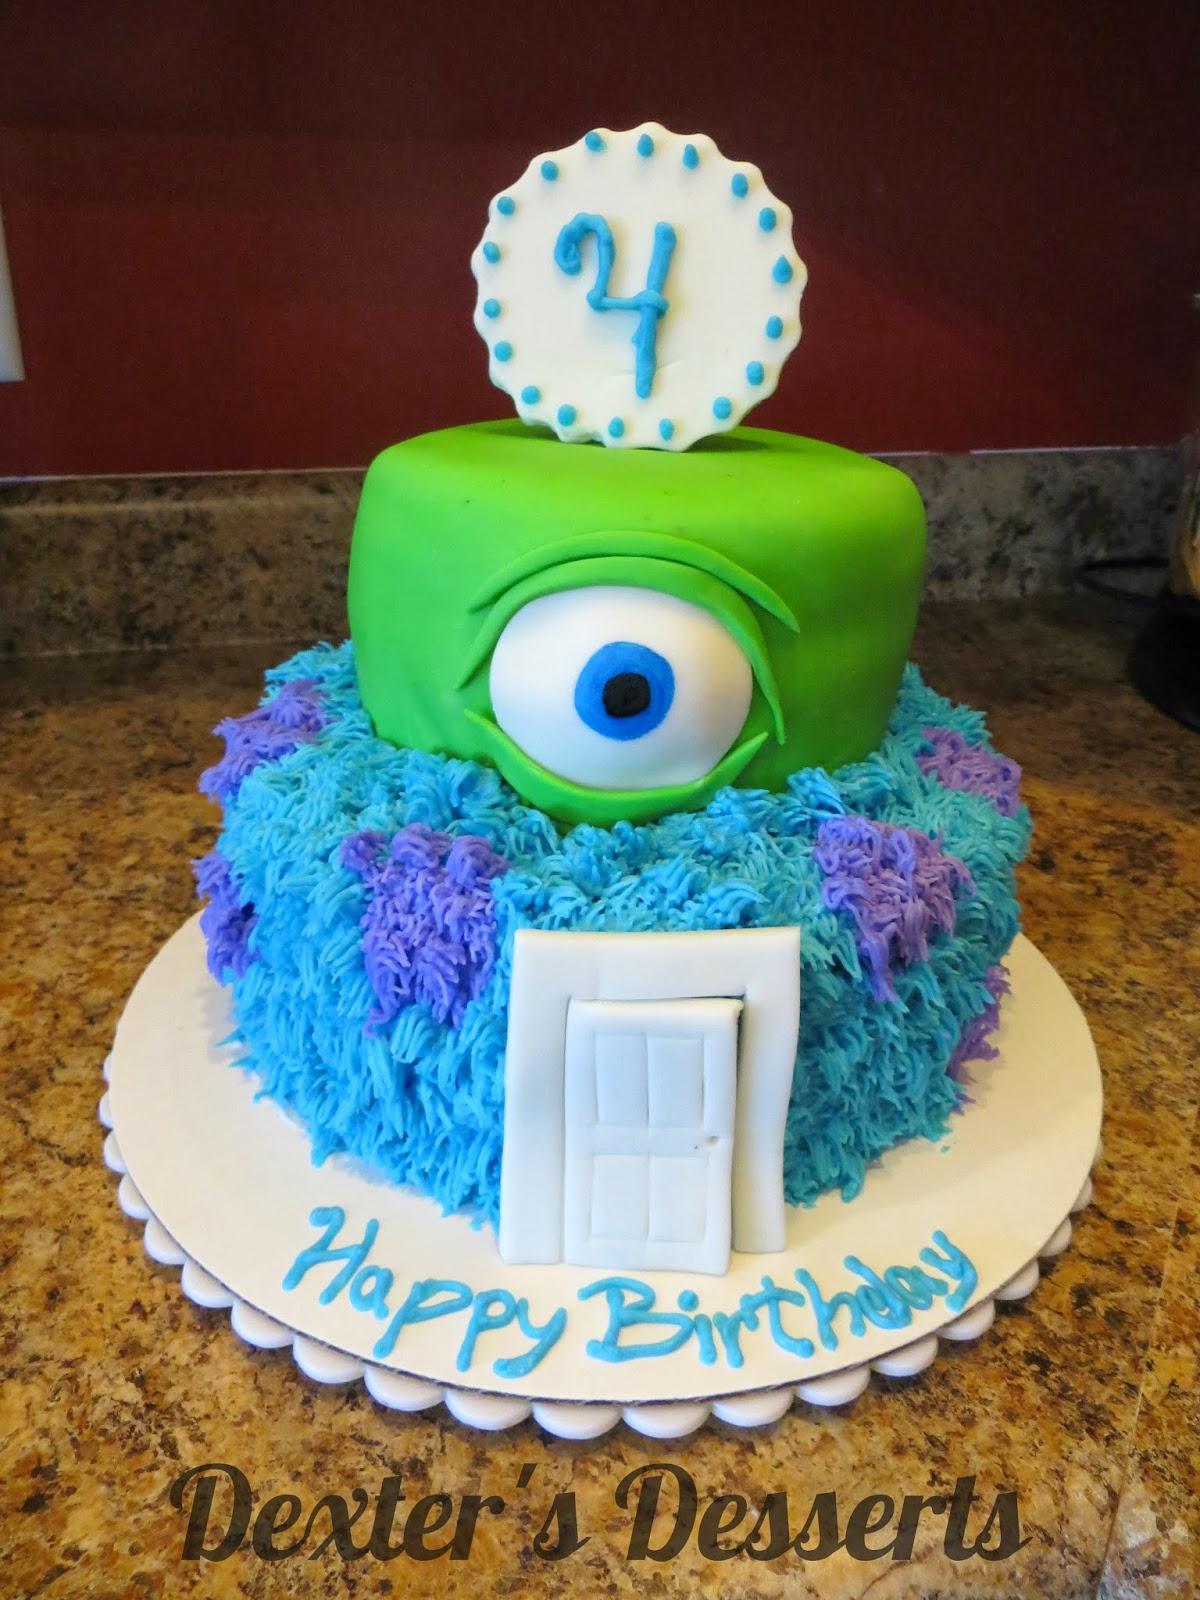 Surprising Dexters Desserts Monster Cake Personalised Birthday Cards Epsylily Jamesorg